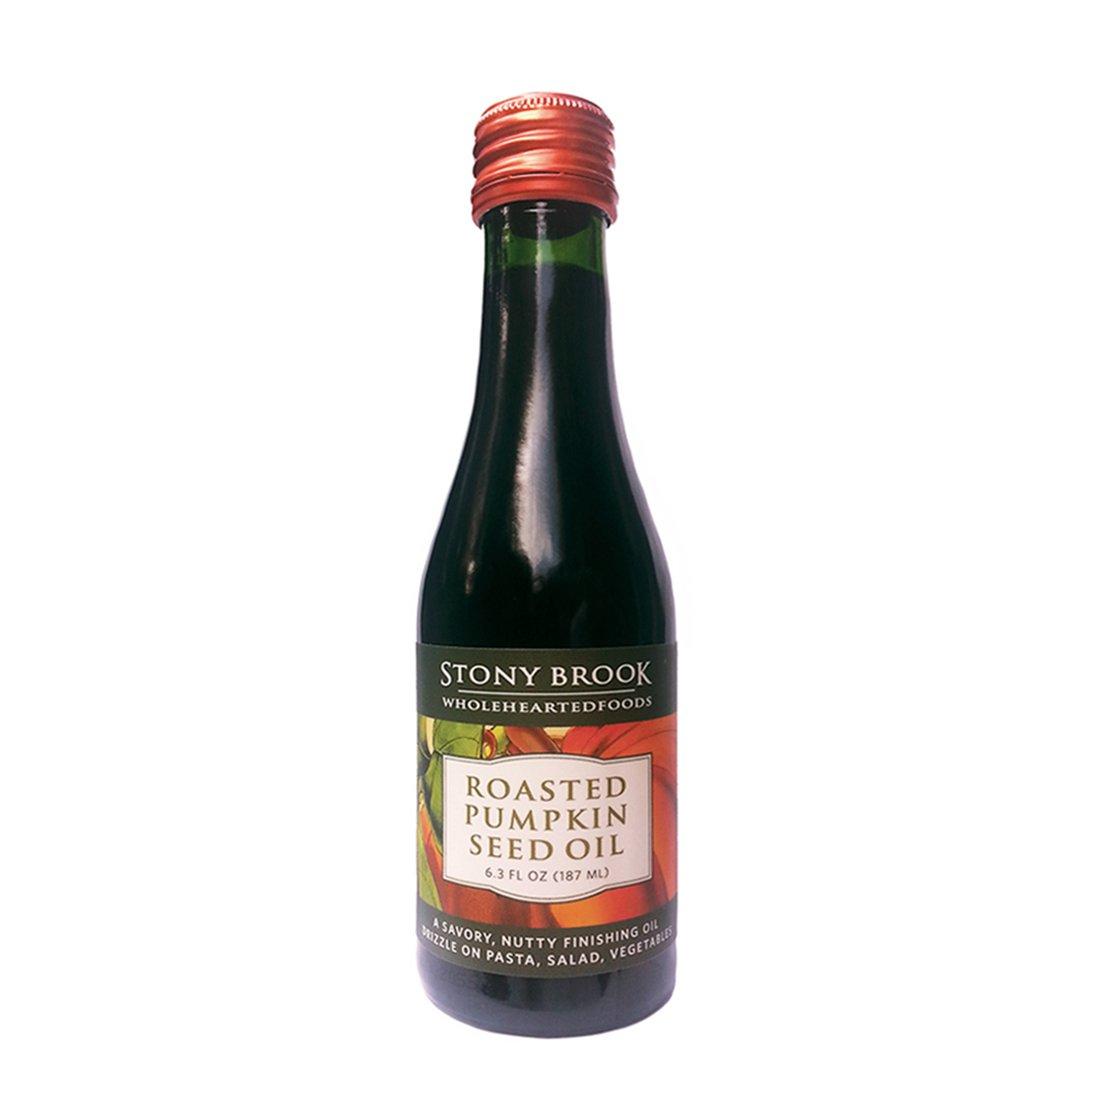 STONY BROOK WHOLEHEARTED FOODS Pumpkin Seed Oil, 6.3 Fluid Ounce